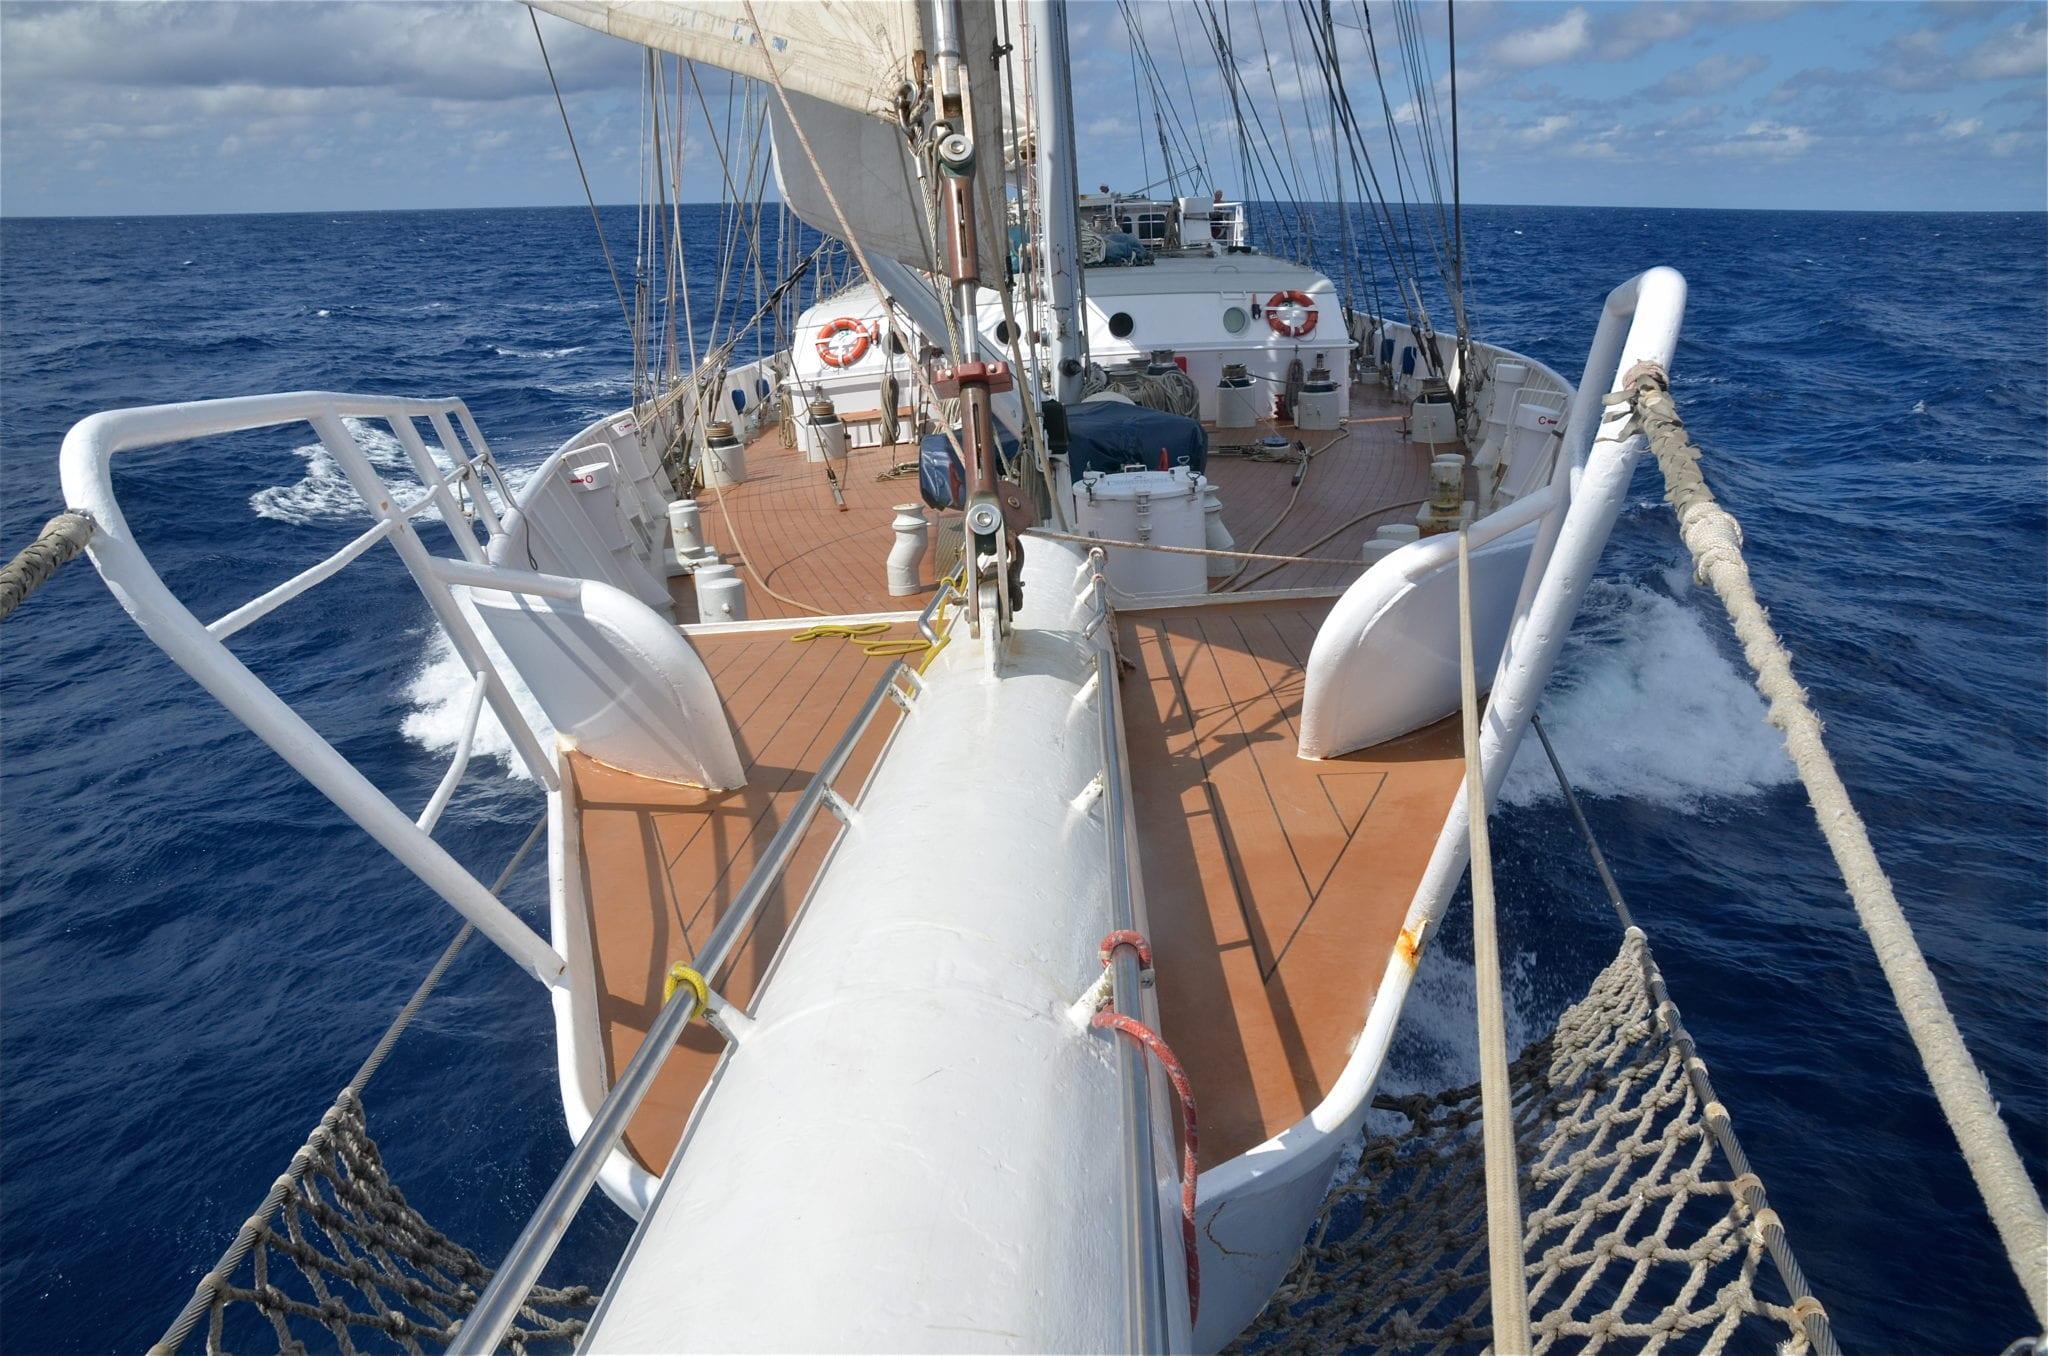 Magnificent life on Sailing Vessel Eendracht